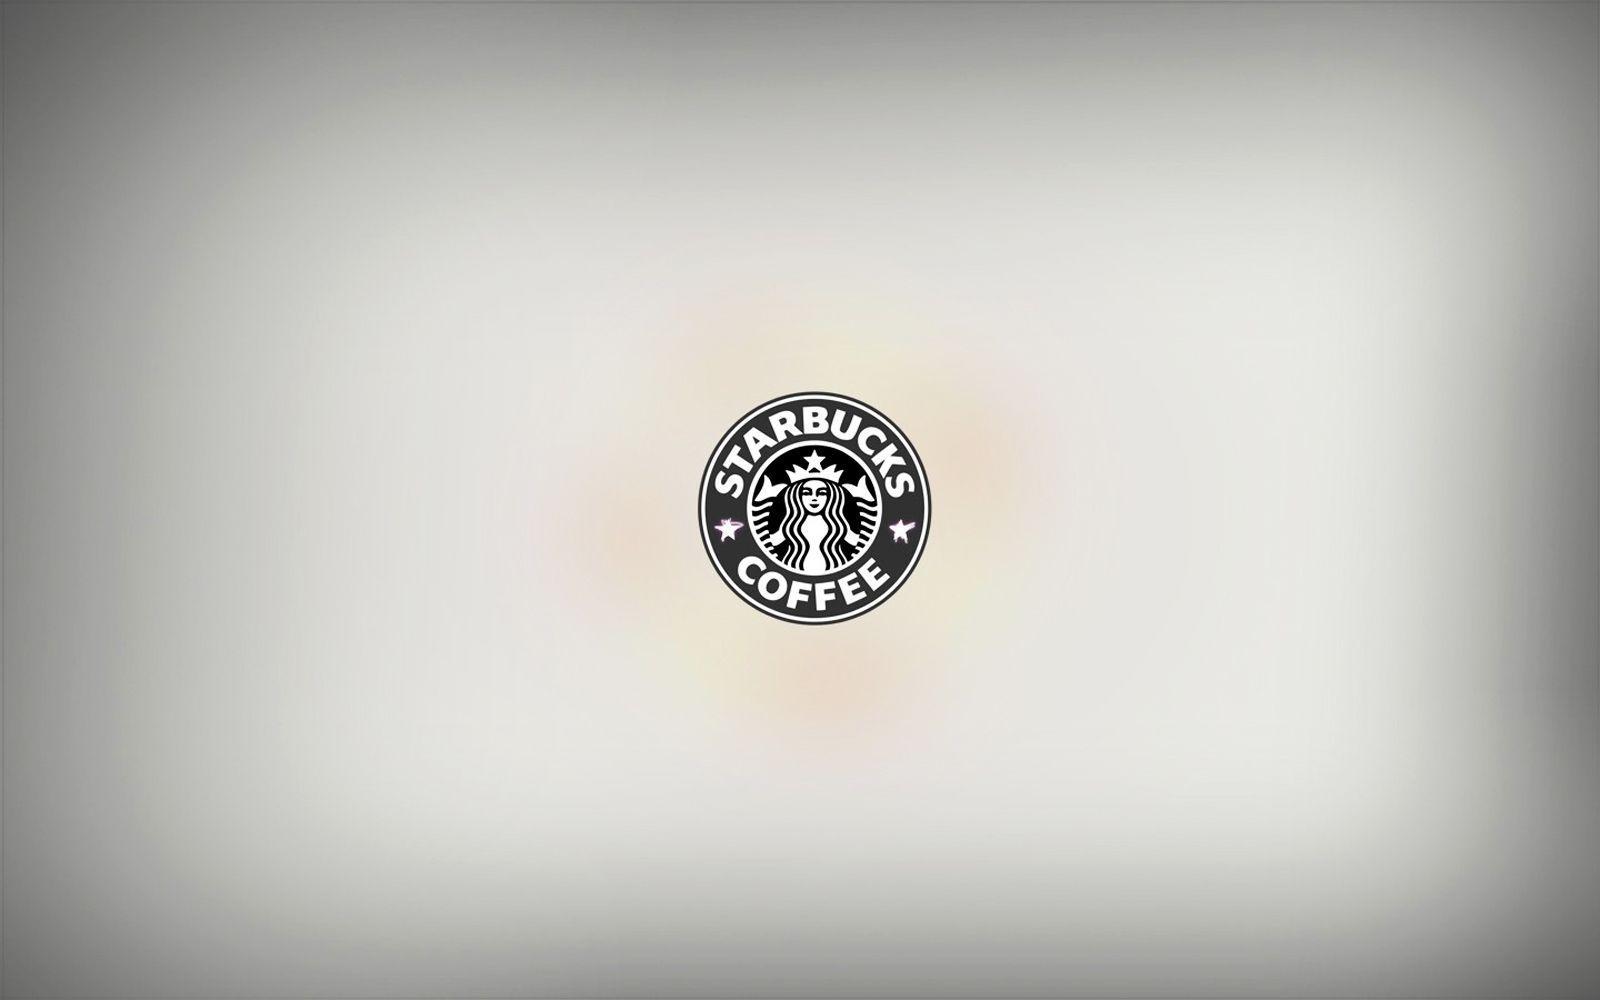 Starbucks Coffee Logo HD Wallpaper | My image